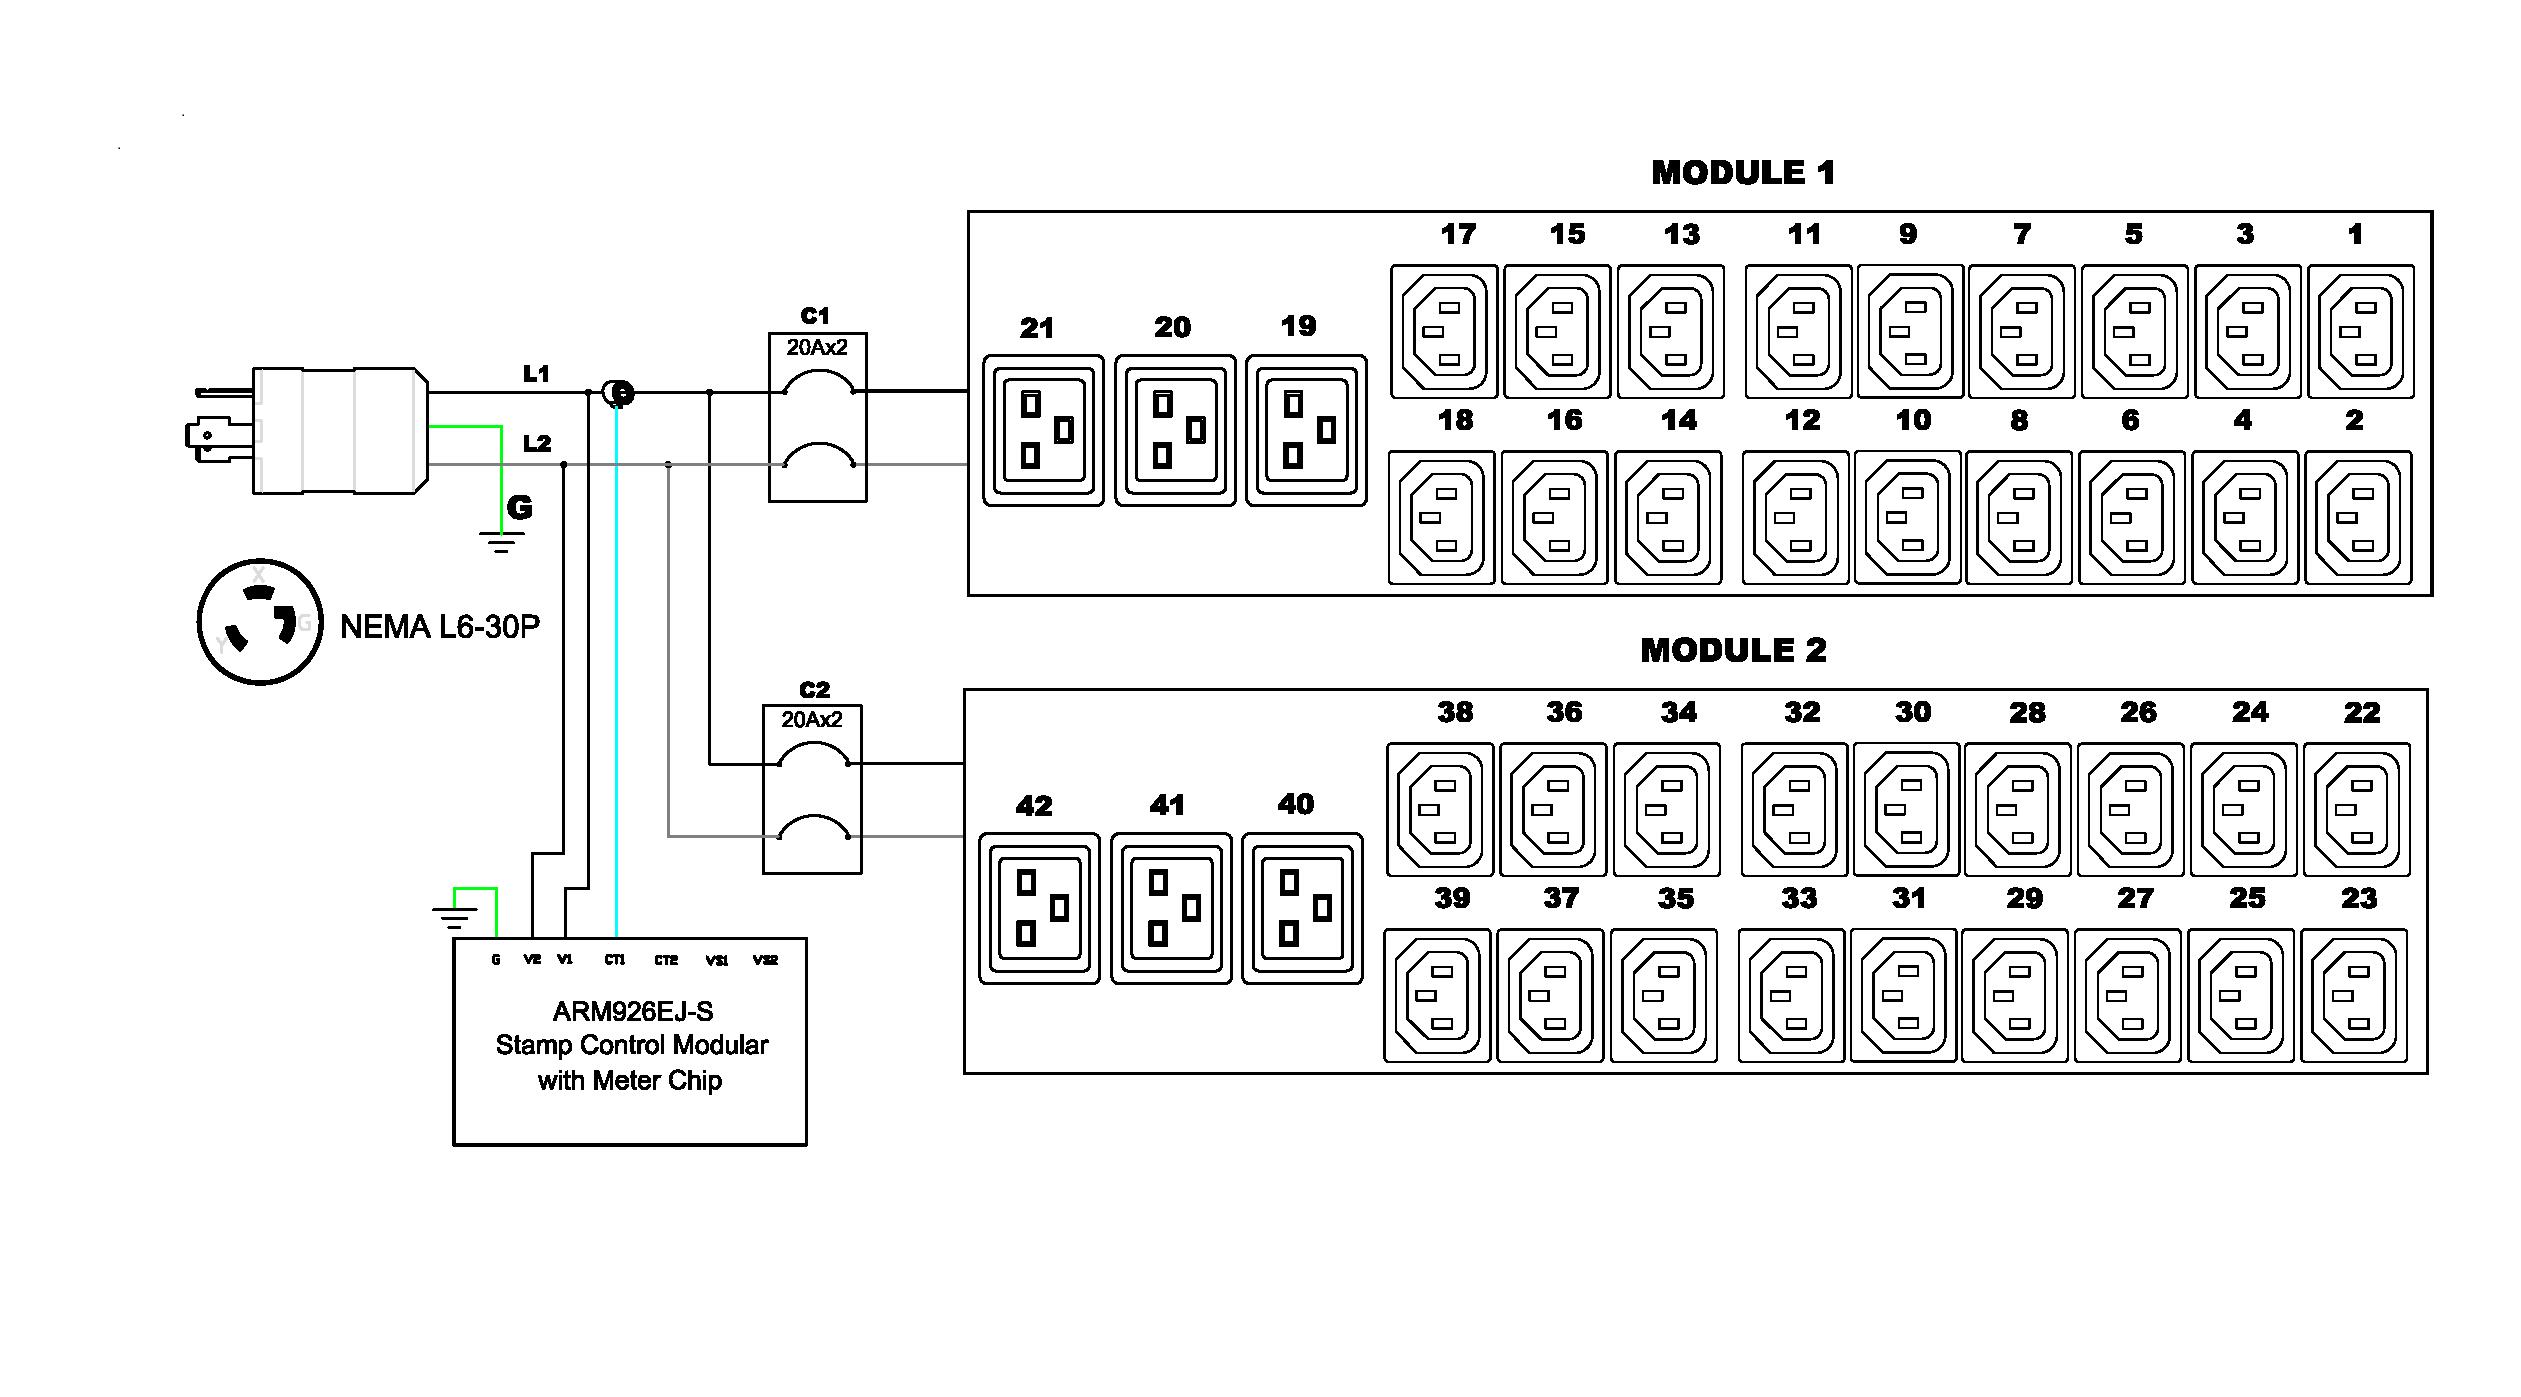 TPXE 1862V pxe 1862v product selector raritan l15 30r wiring diagram at bakdesigns.co